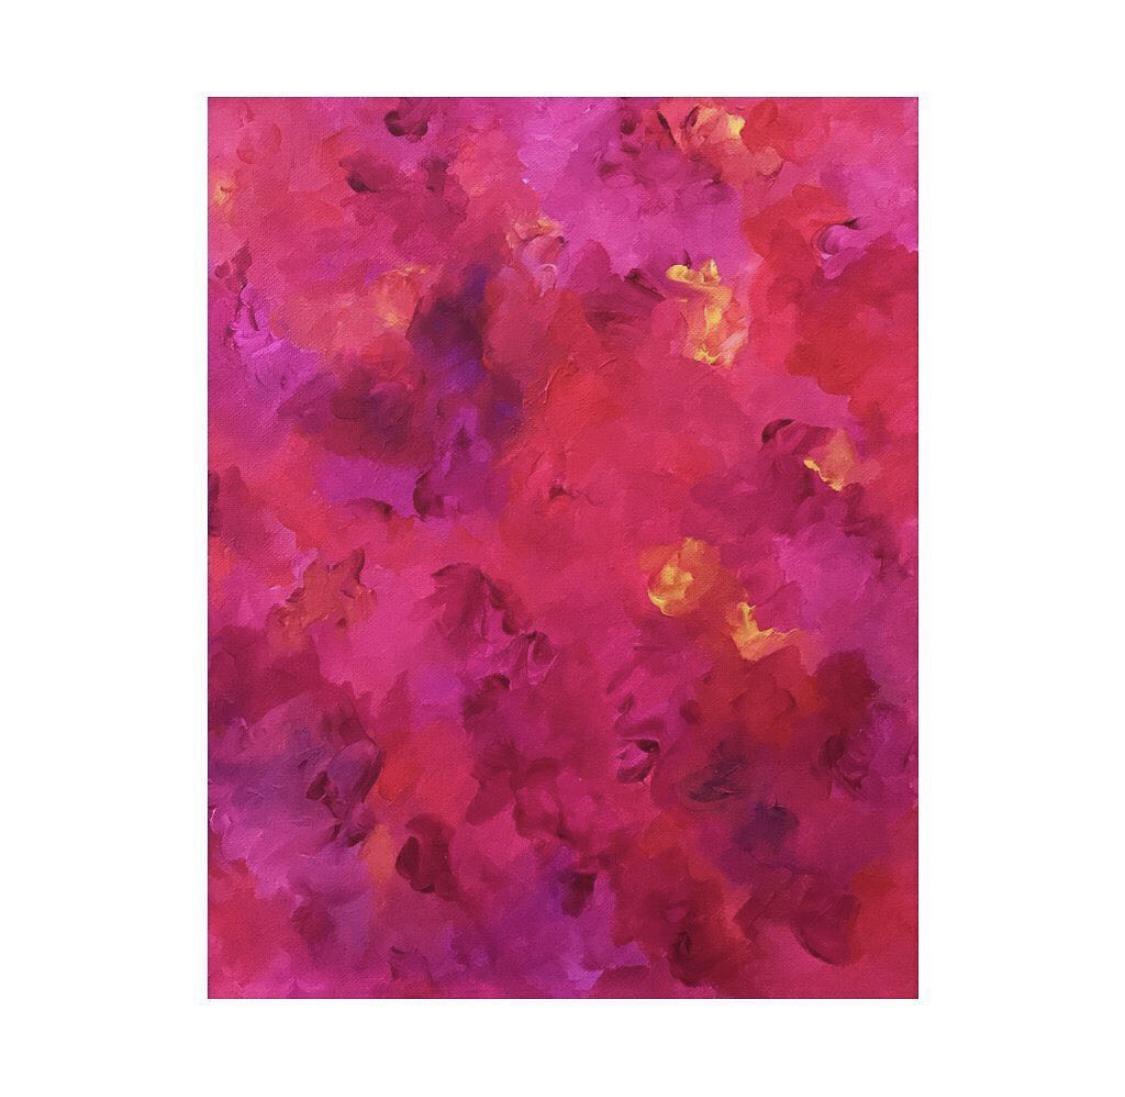 Portfolio - Violet Roots - Abstract Painting - Romantics